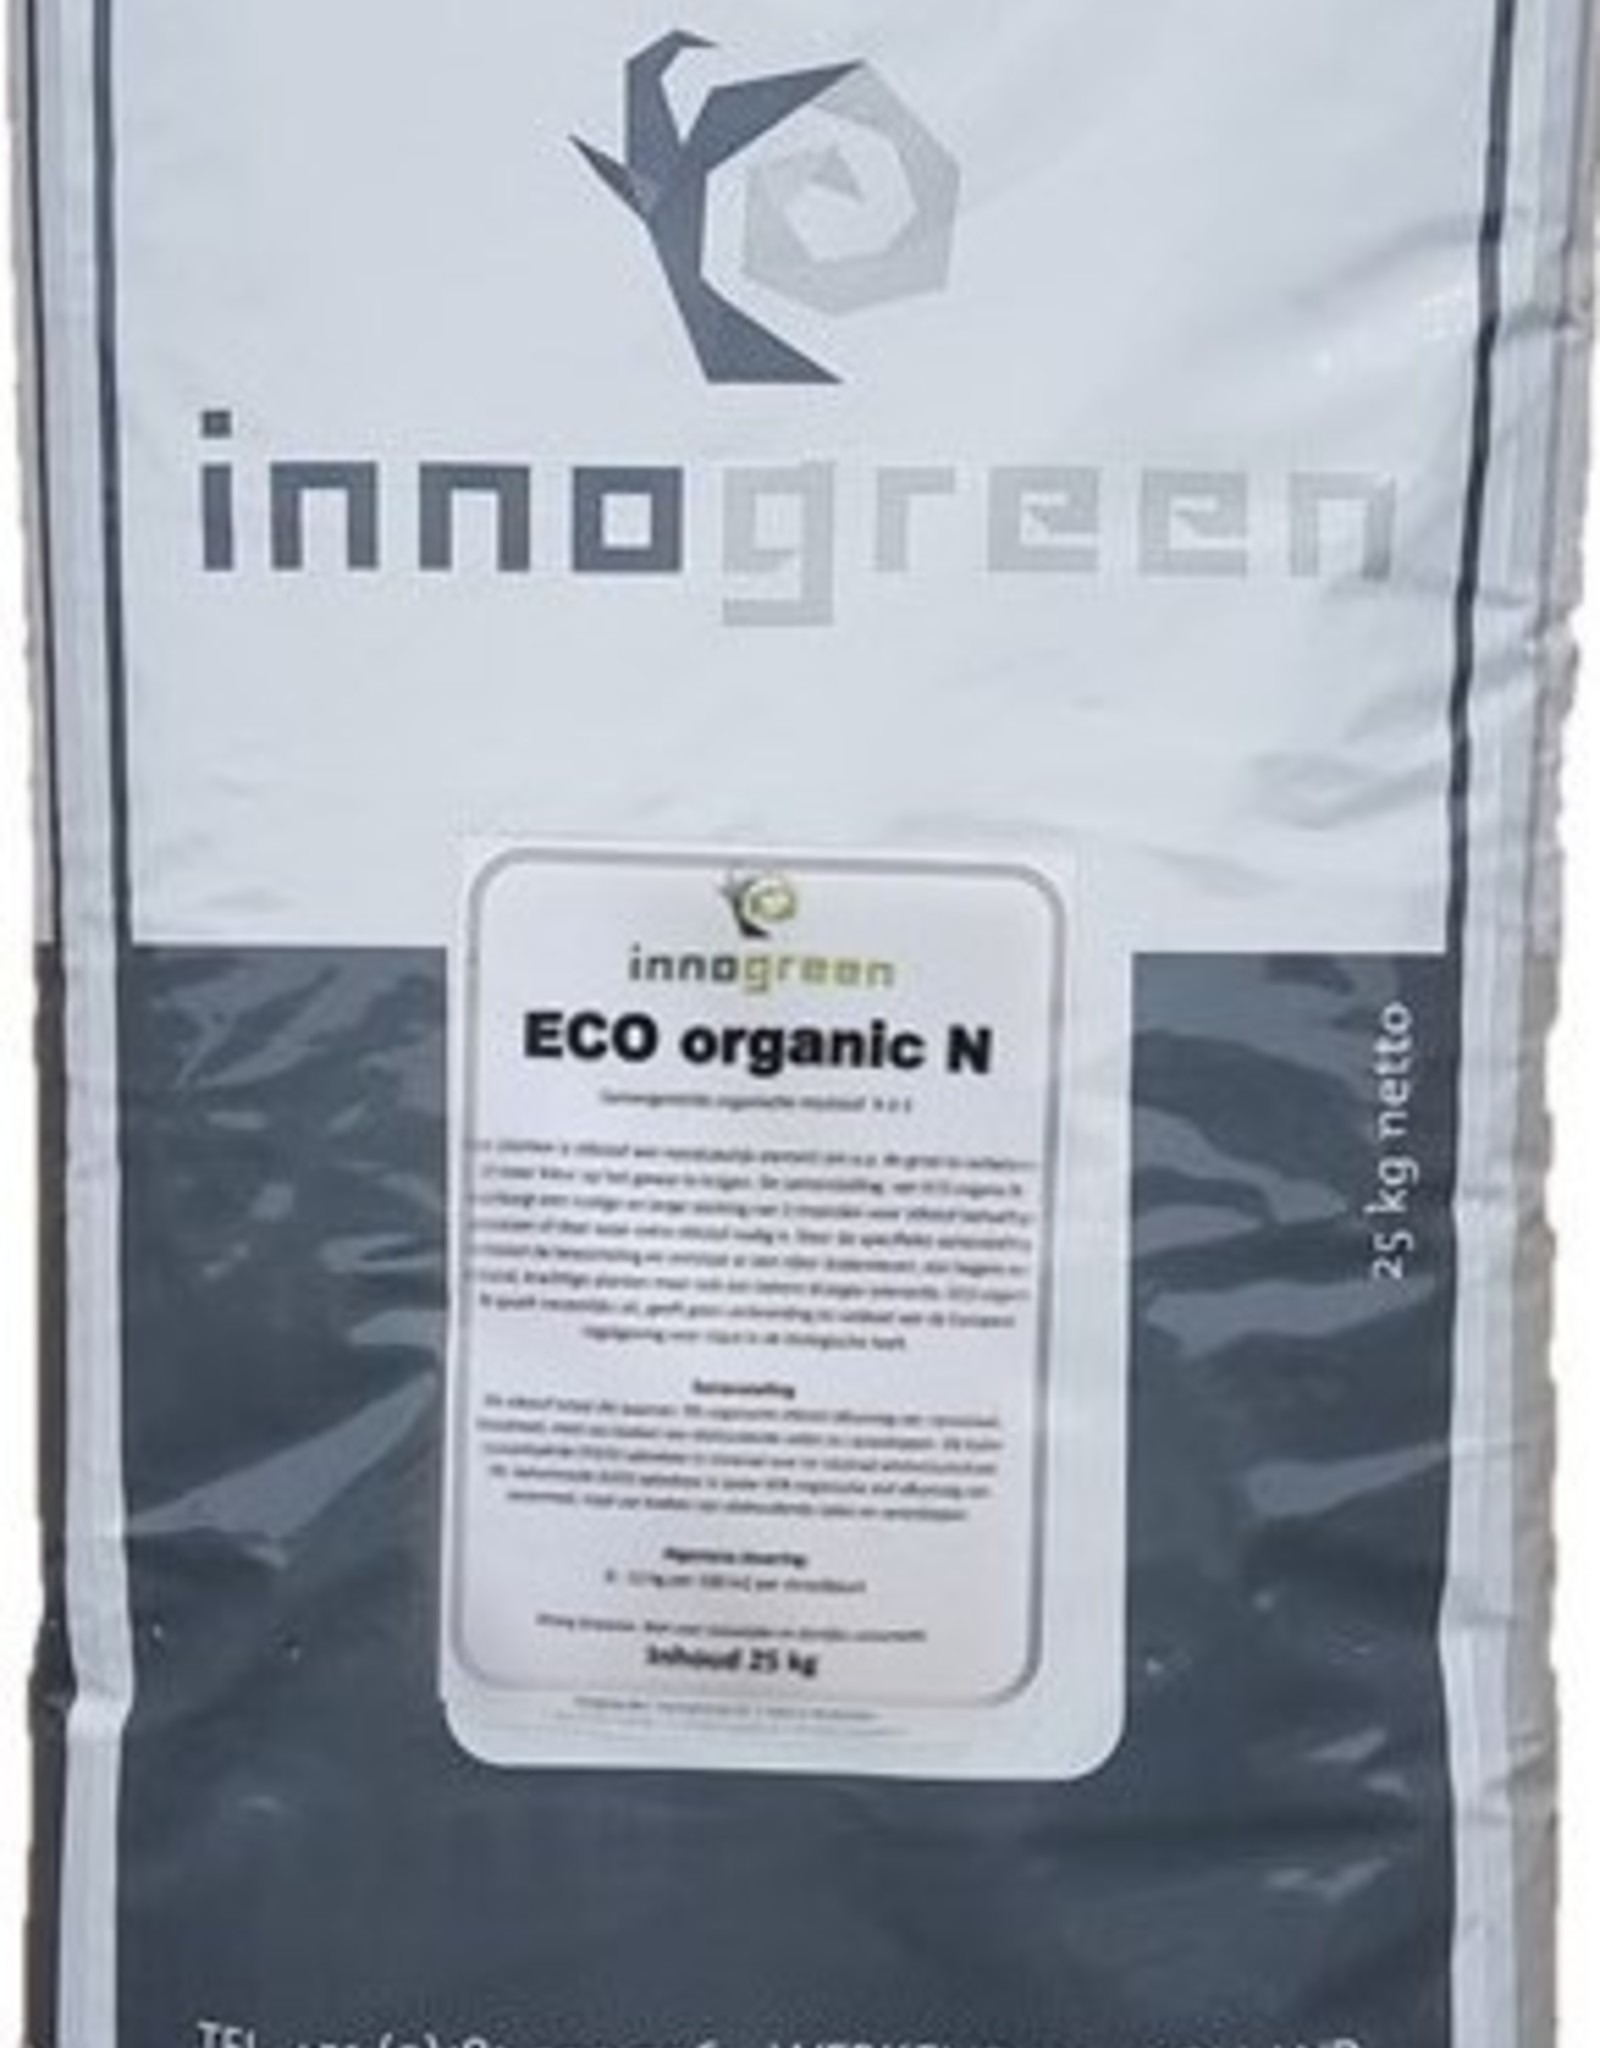 Brimex Innogreen Innogreen ECO Organic N 9-3-3 FiBL / Skal